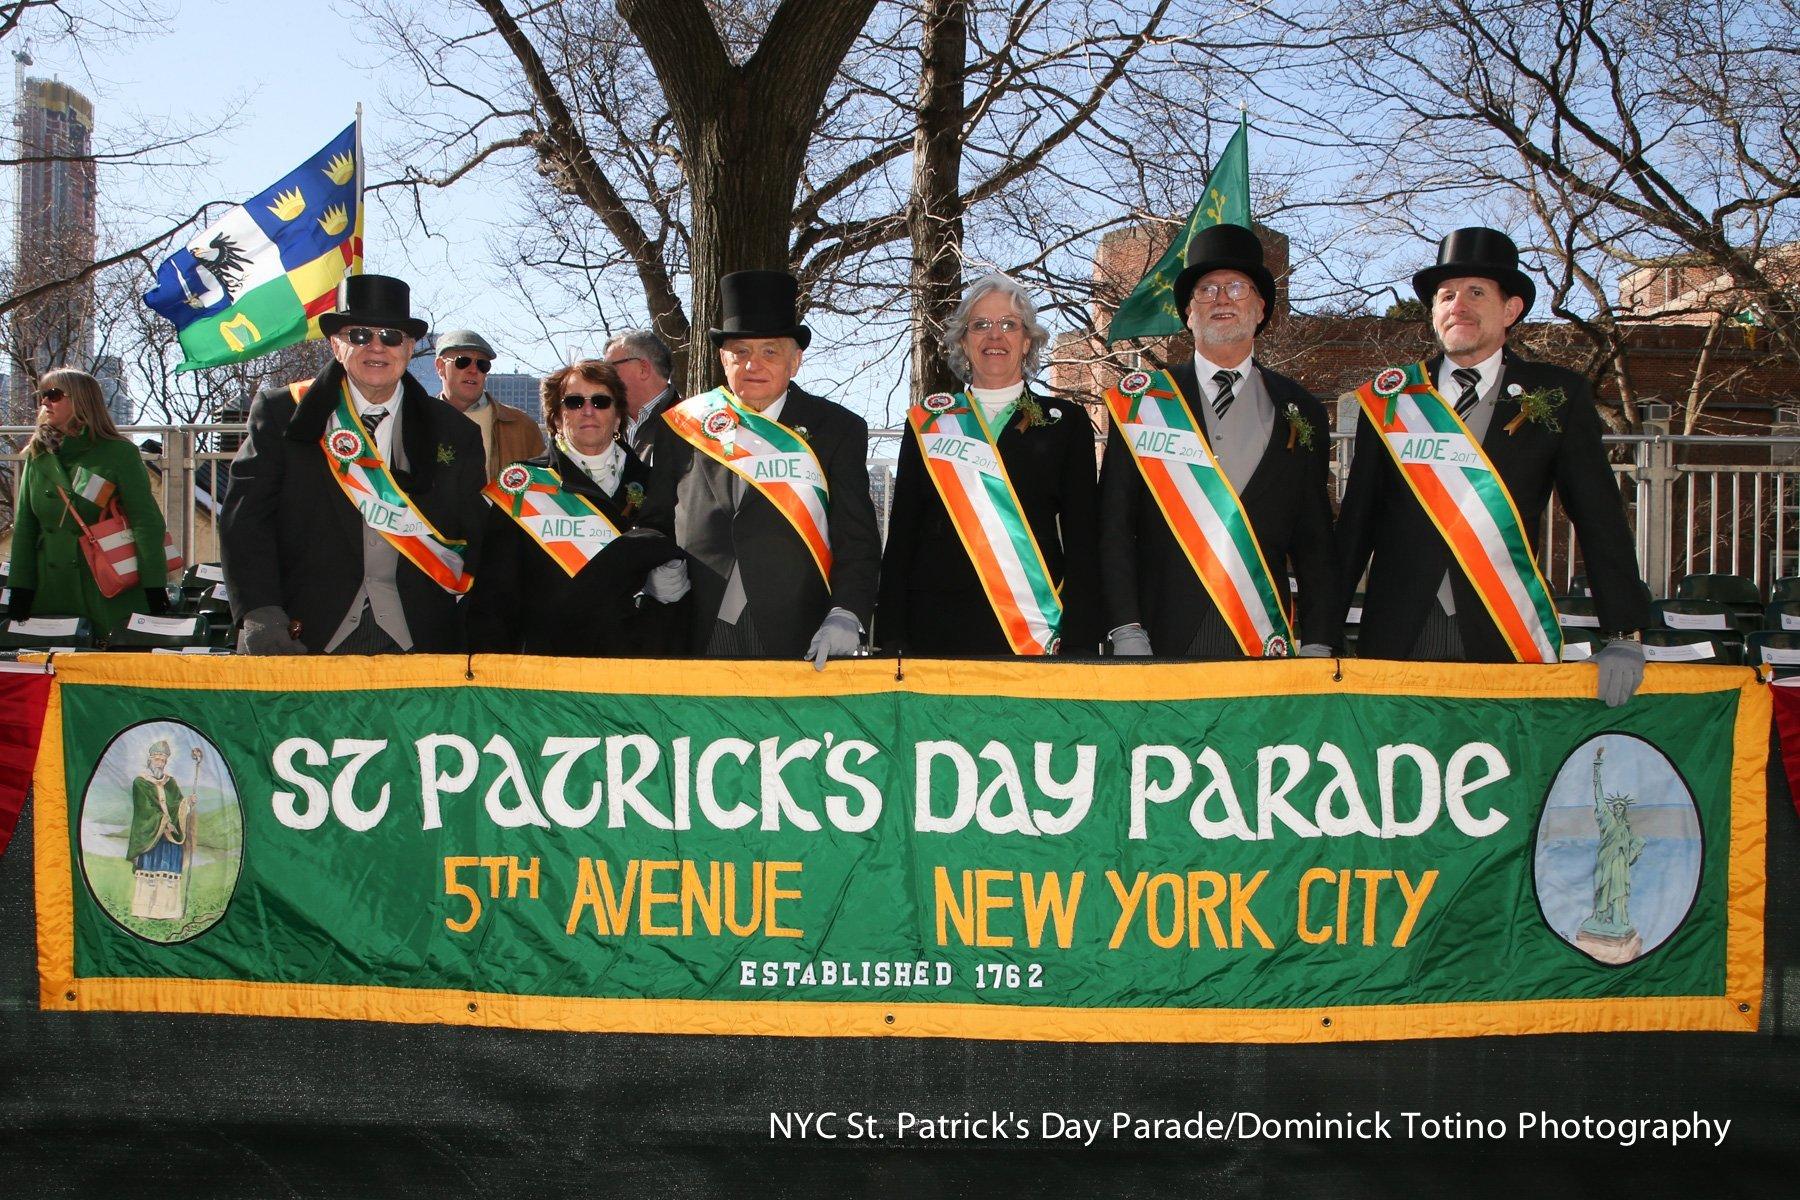 St Patrick's Day Parade on 5th Avenue, New York City